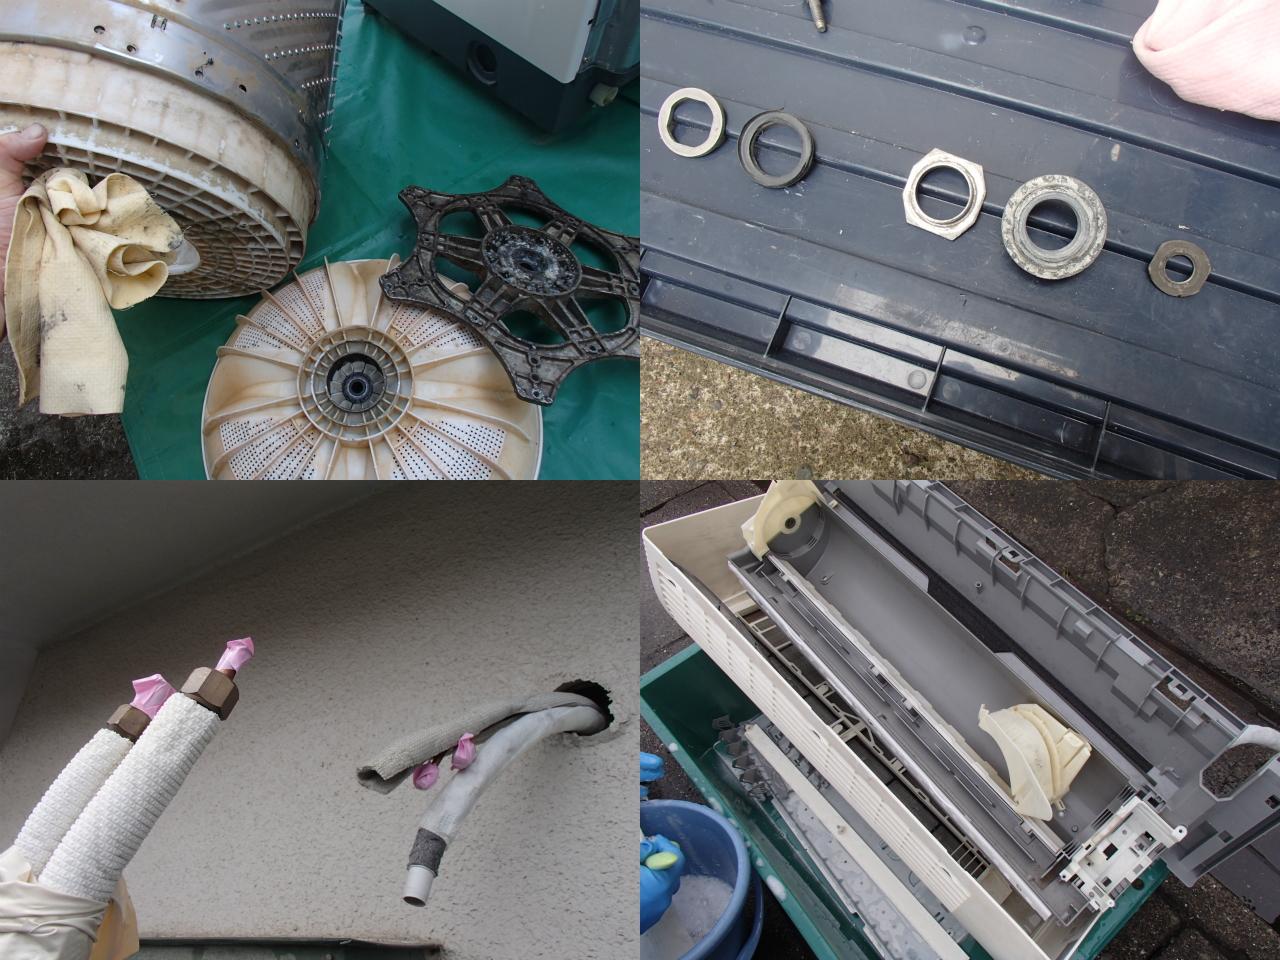 http://ajras.net/images/120329-washingmachine2.jpg